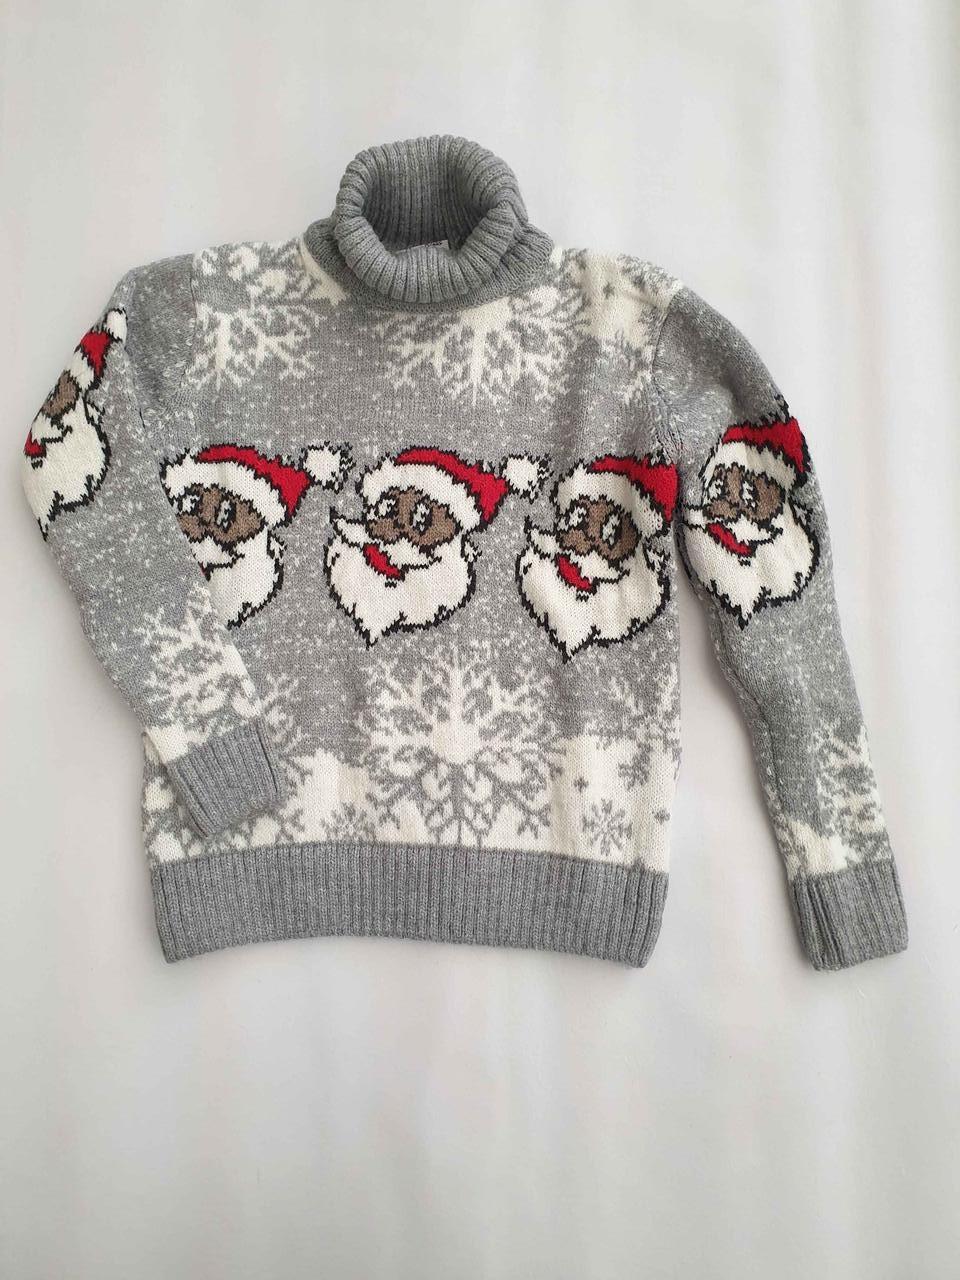 Новогодний свитер на мальчиков 2-6 лет Дед мороз